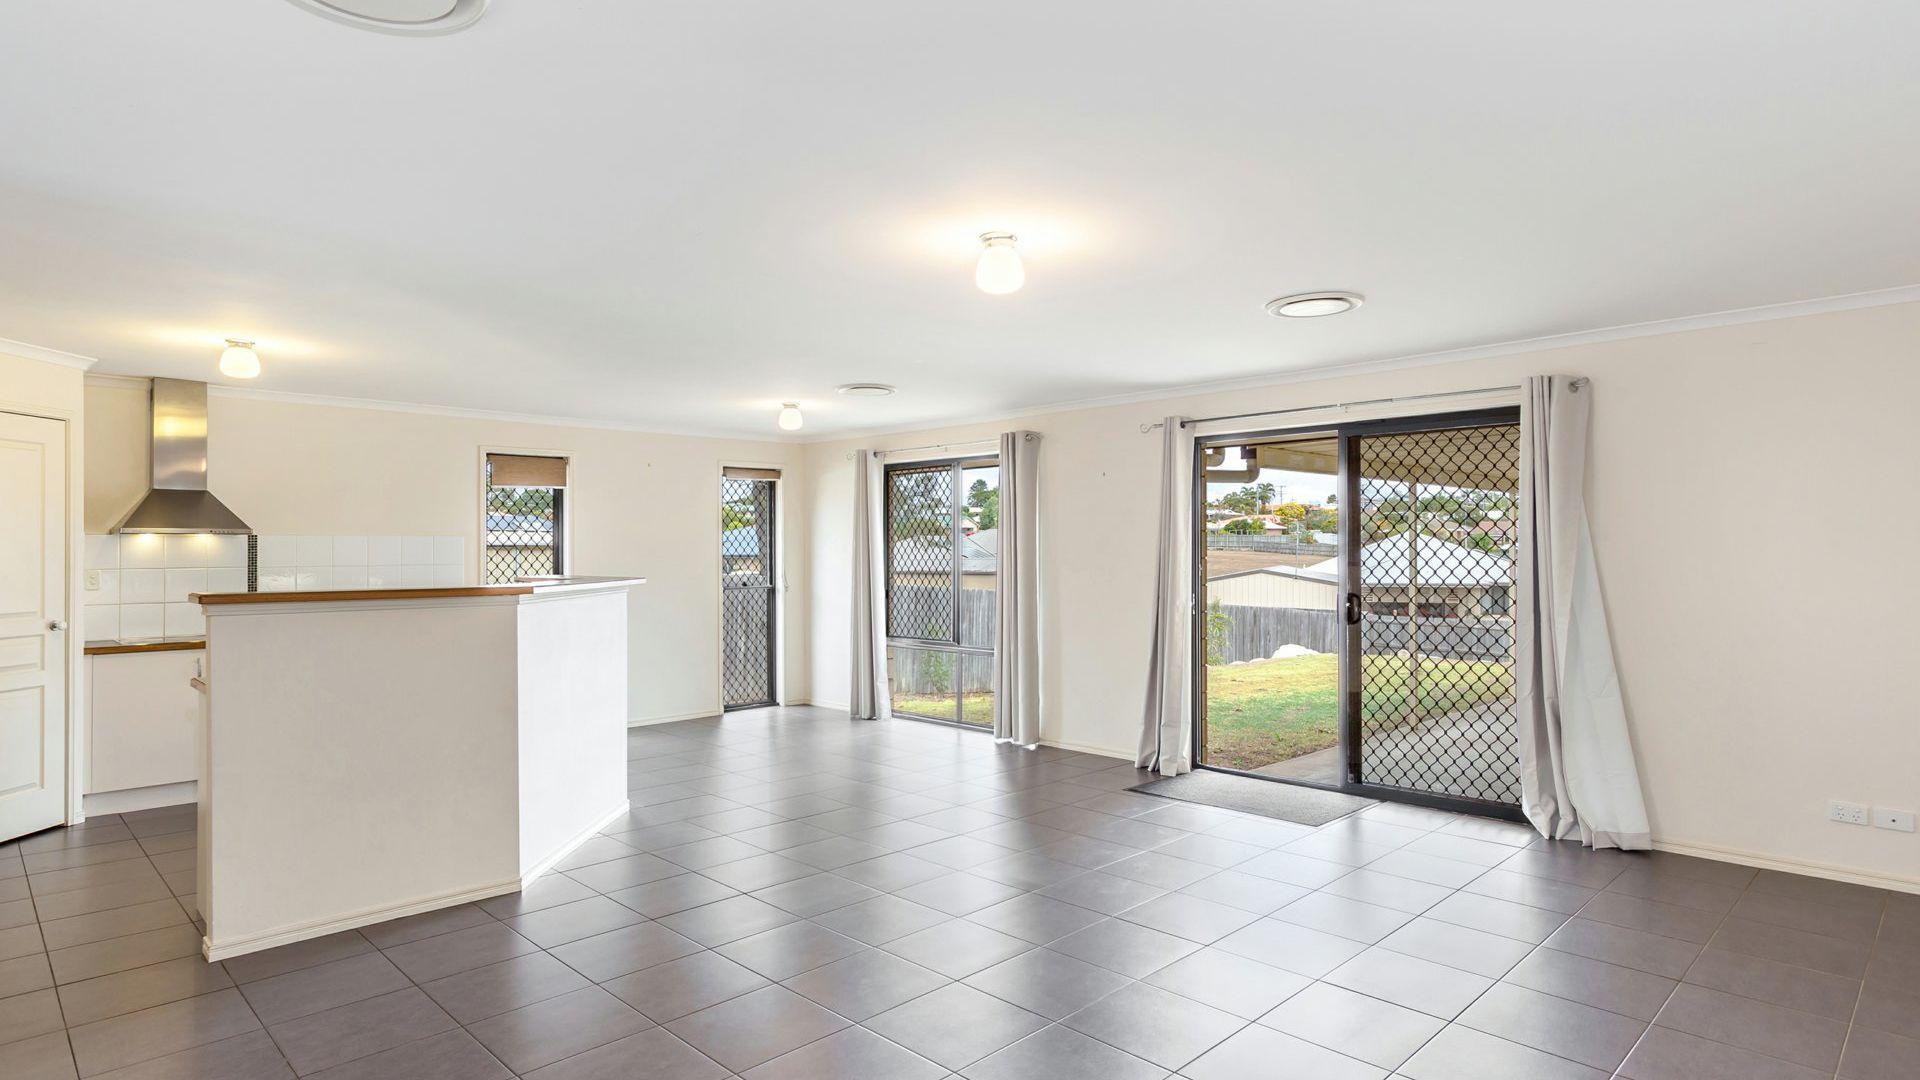 53 Highview Ave, Gatton QLD 4343, Image 1